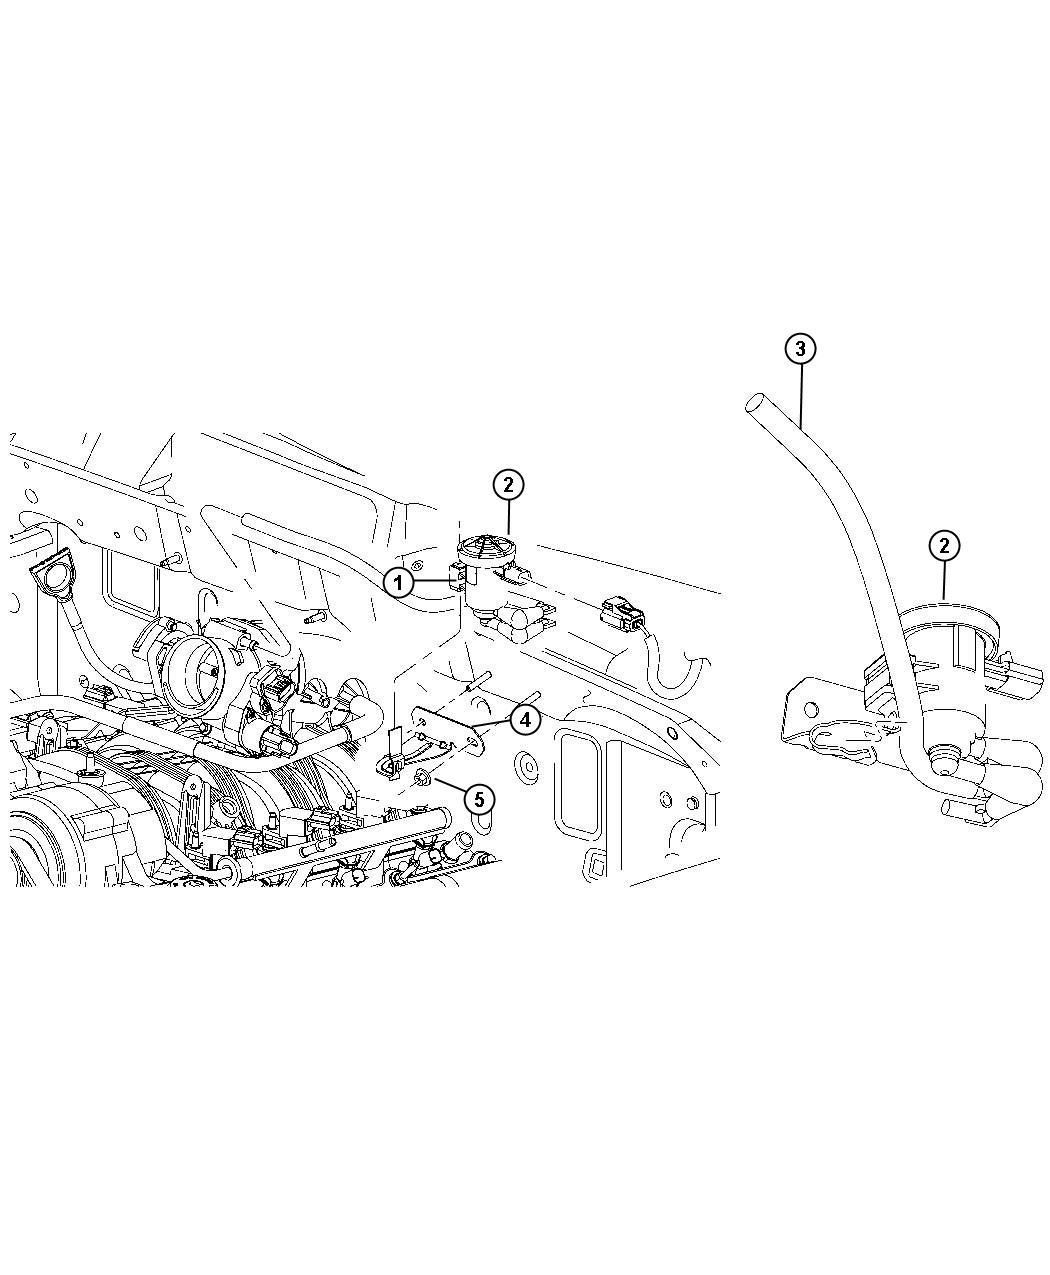 Dodge Dakota Bracket Linear Purge Valve